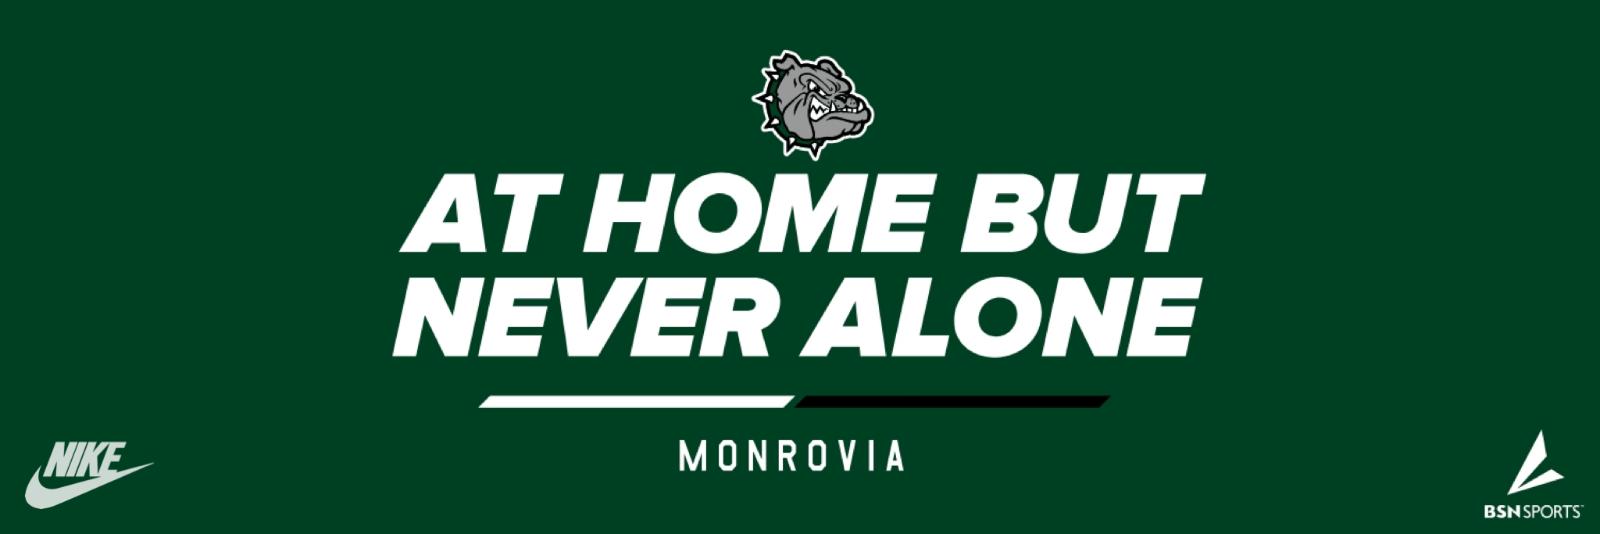 Monrovia Bulldogs – Social Media Graphics